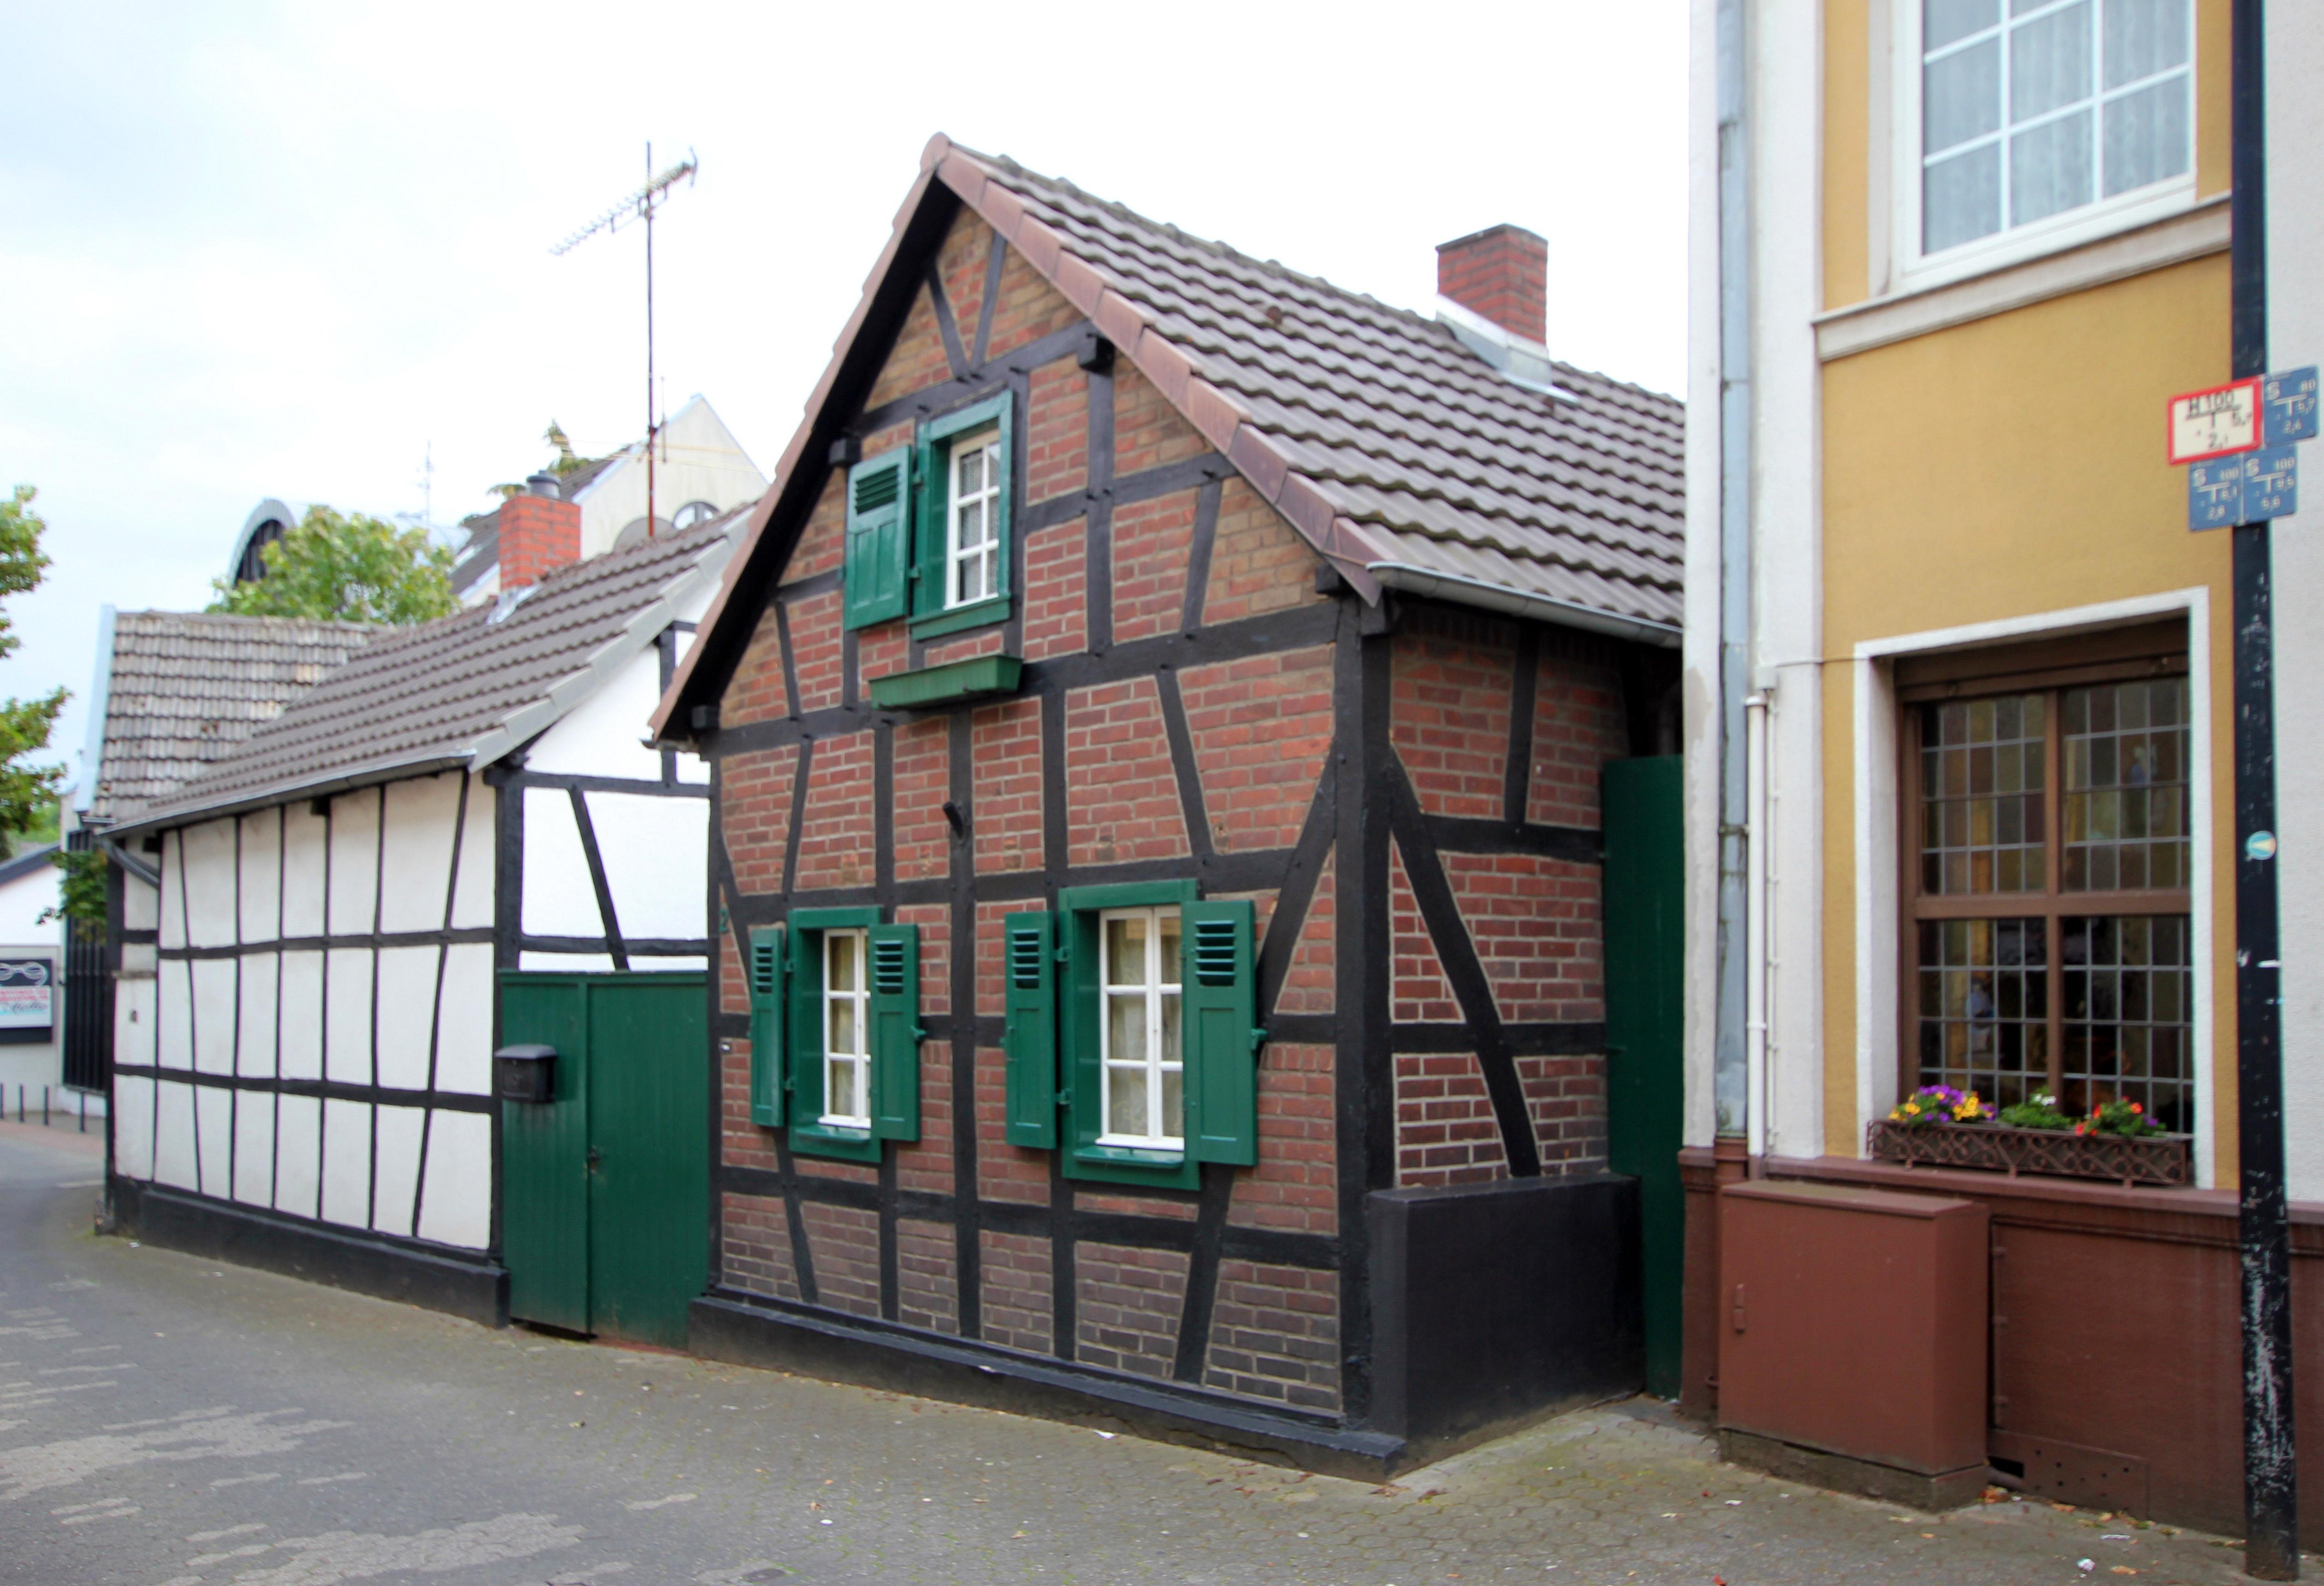 File:Alt-Hürth Pastoratstraße 2.jpg - Wikimedia Commons